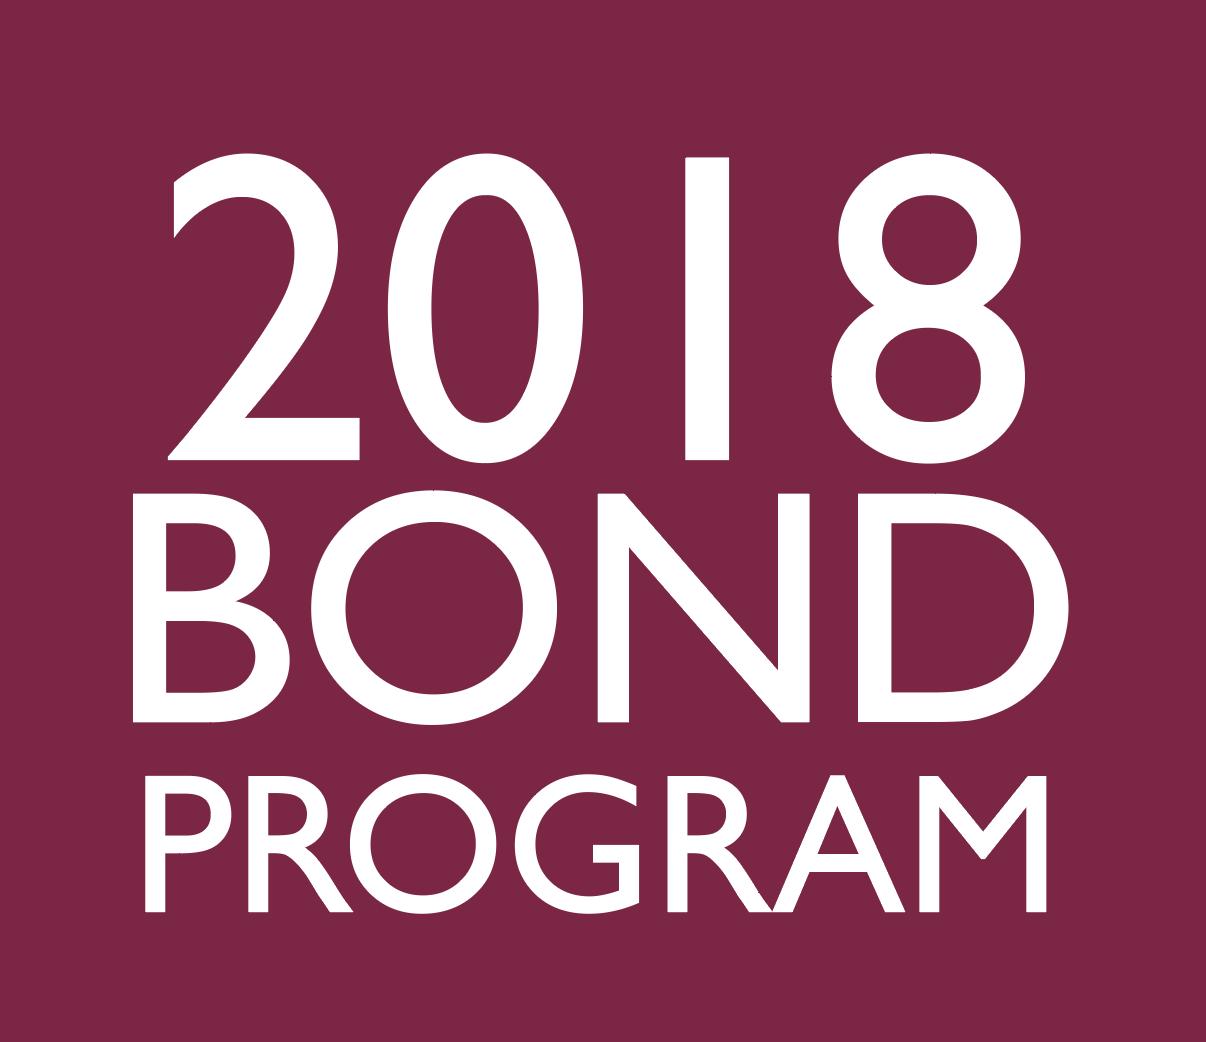 2018 Bond Program featured image